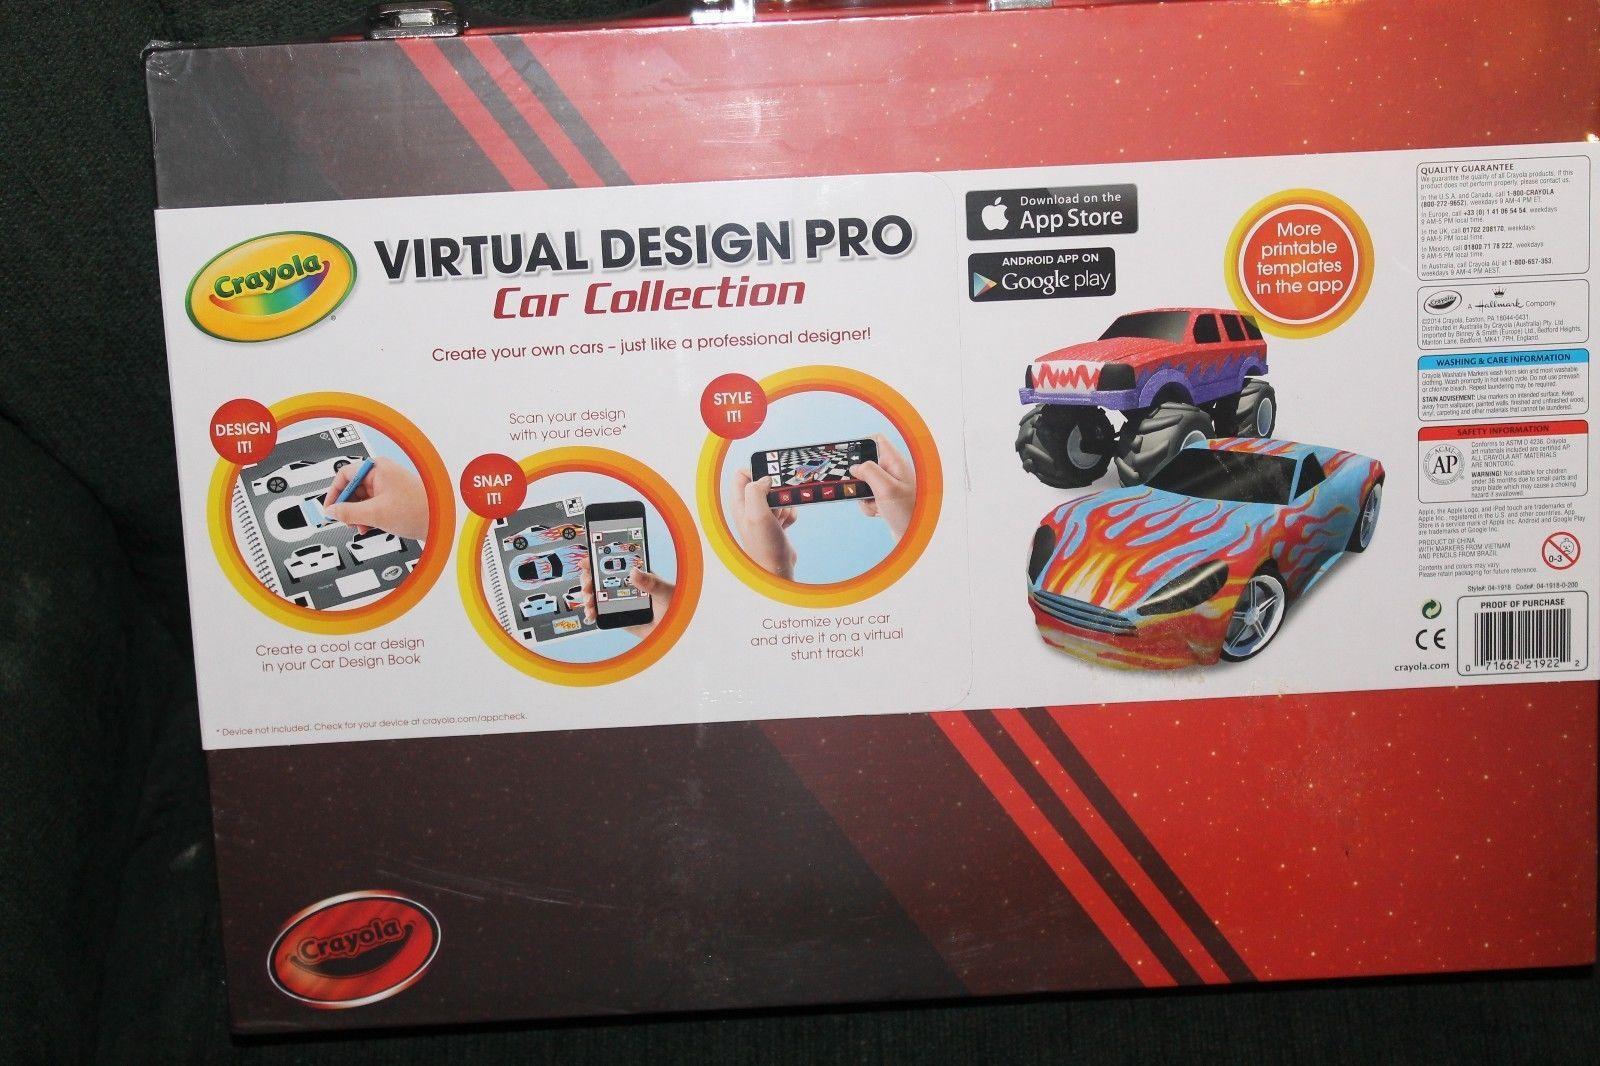 crayola virtual design pro car collection new and 20 similar items